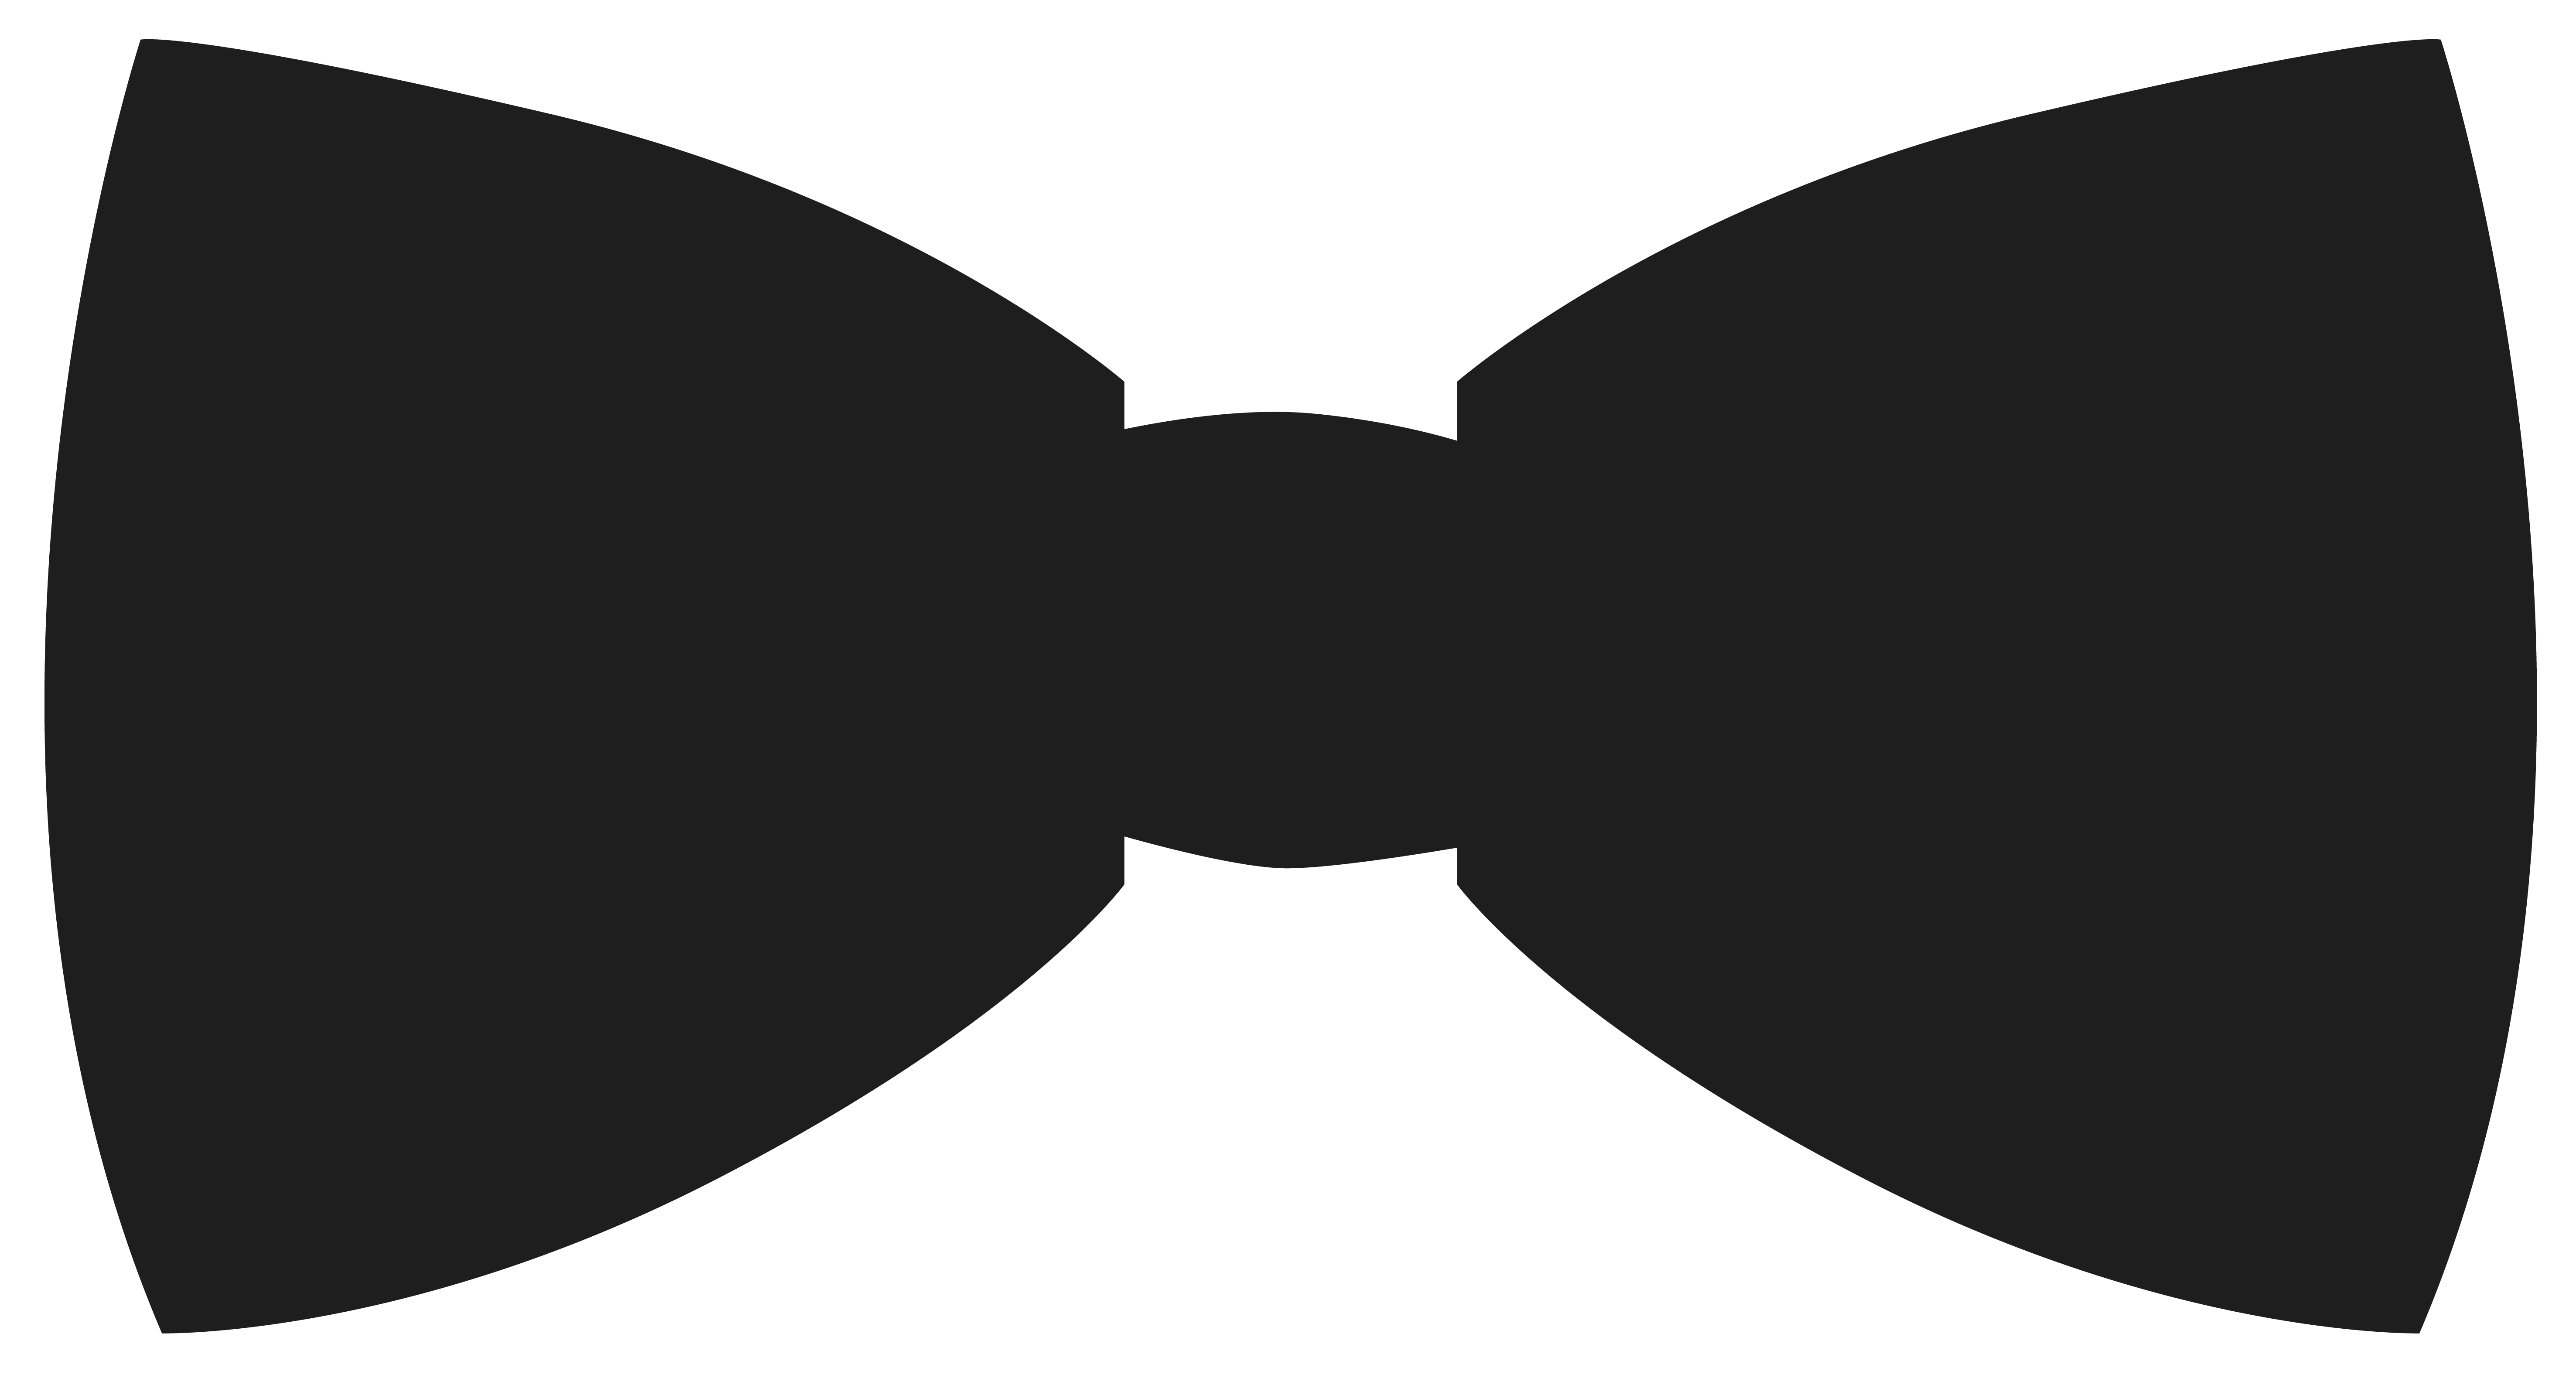 Black bow tie clipart graphic transparent stock Free Bow Tie Cliparts, Download Free Clip Art, Free Clip Art ... graphic transparent stock